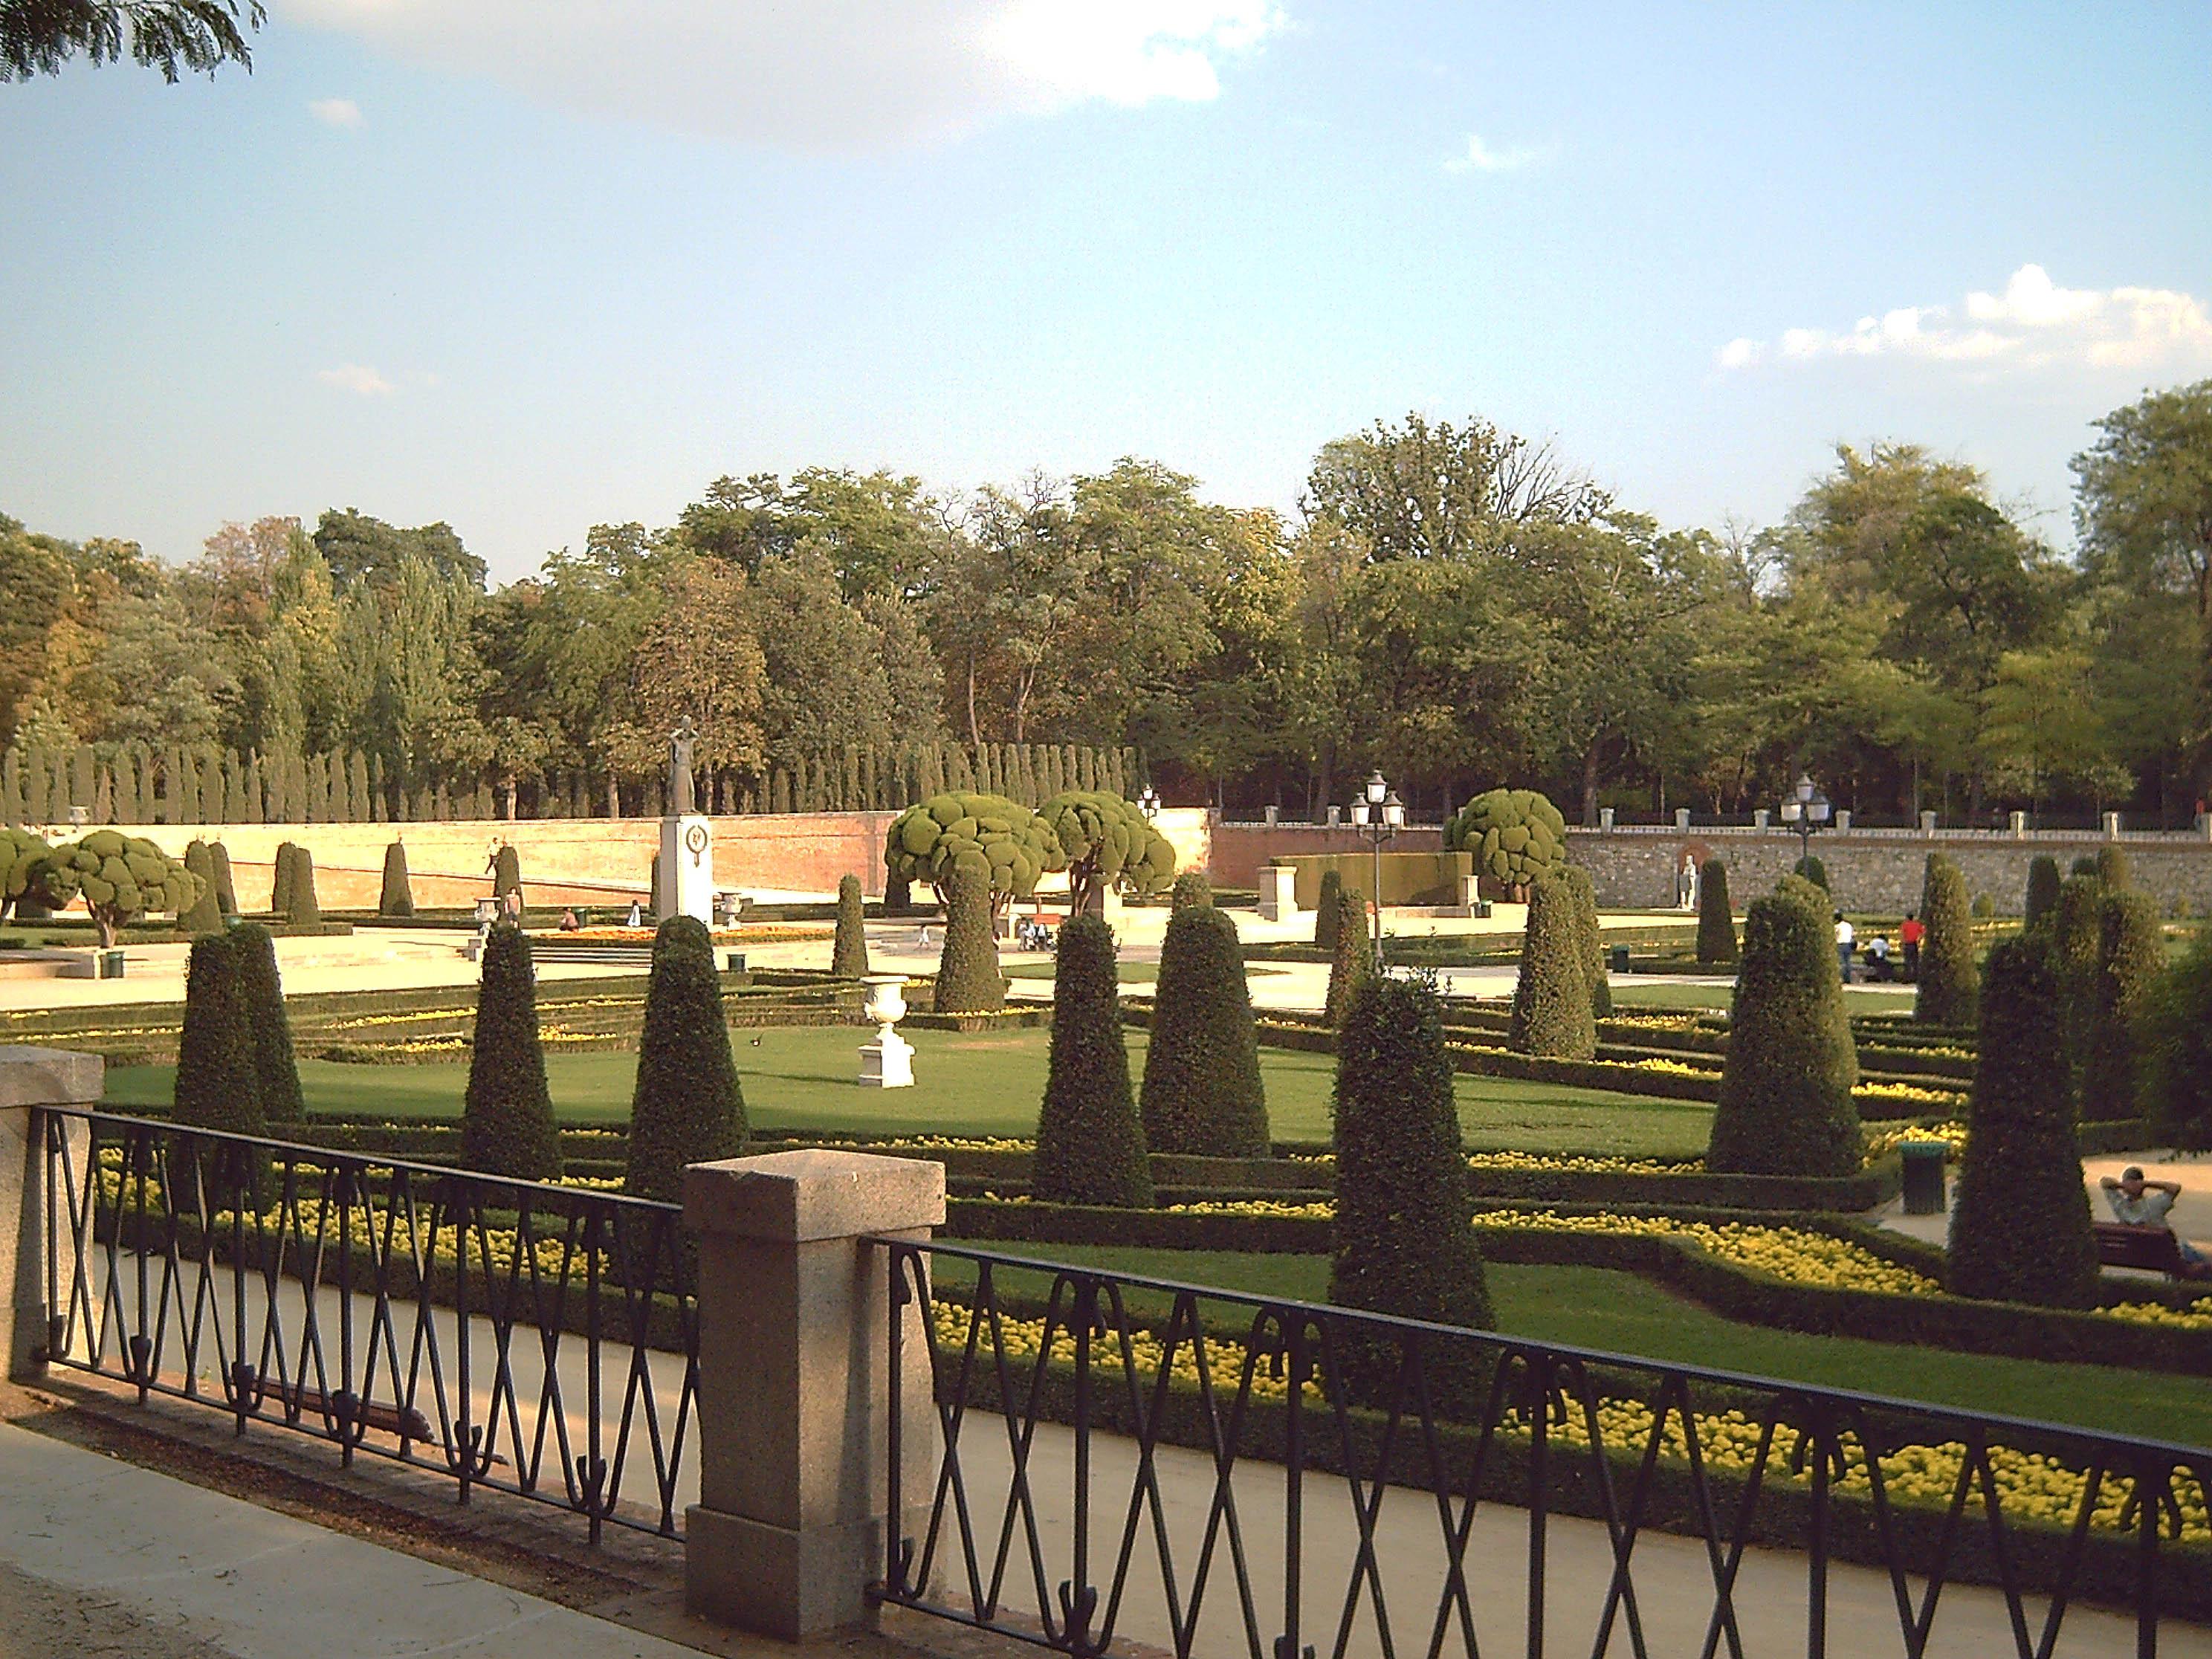 Archivo Jardines Del Buen Retiro Parterre Madrid 01 Jpg Wikipedia La Enciclopedia Libre